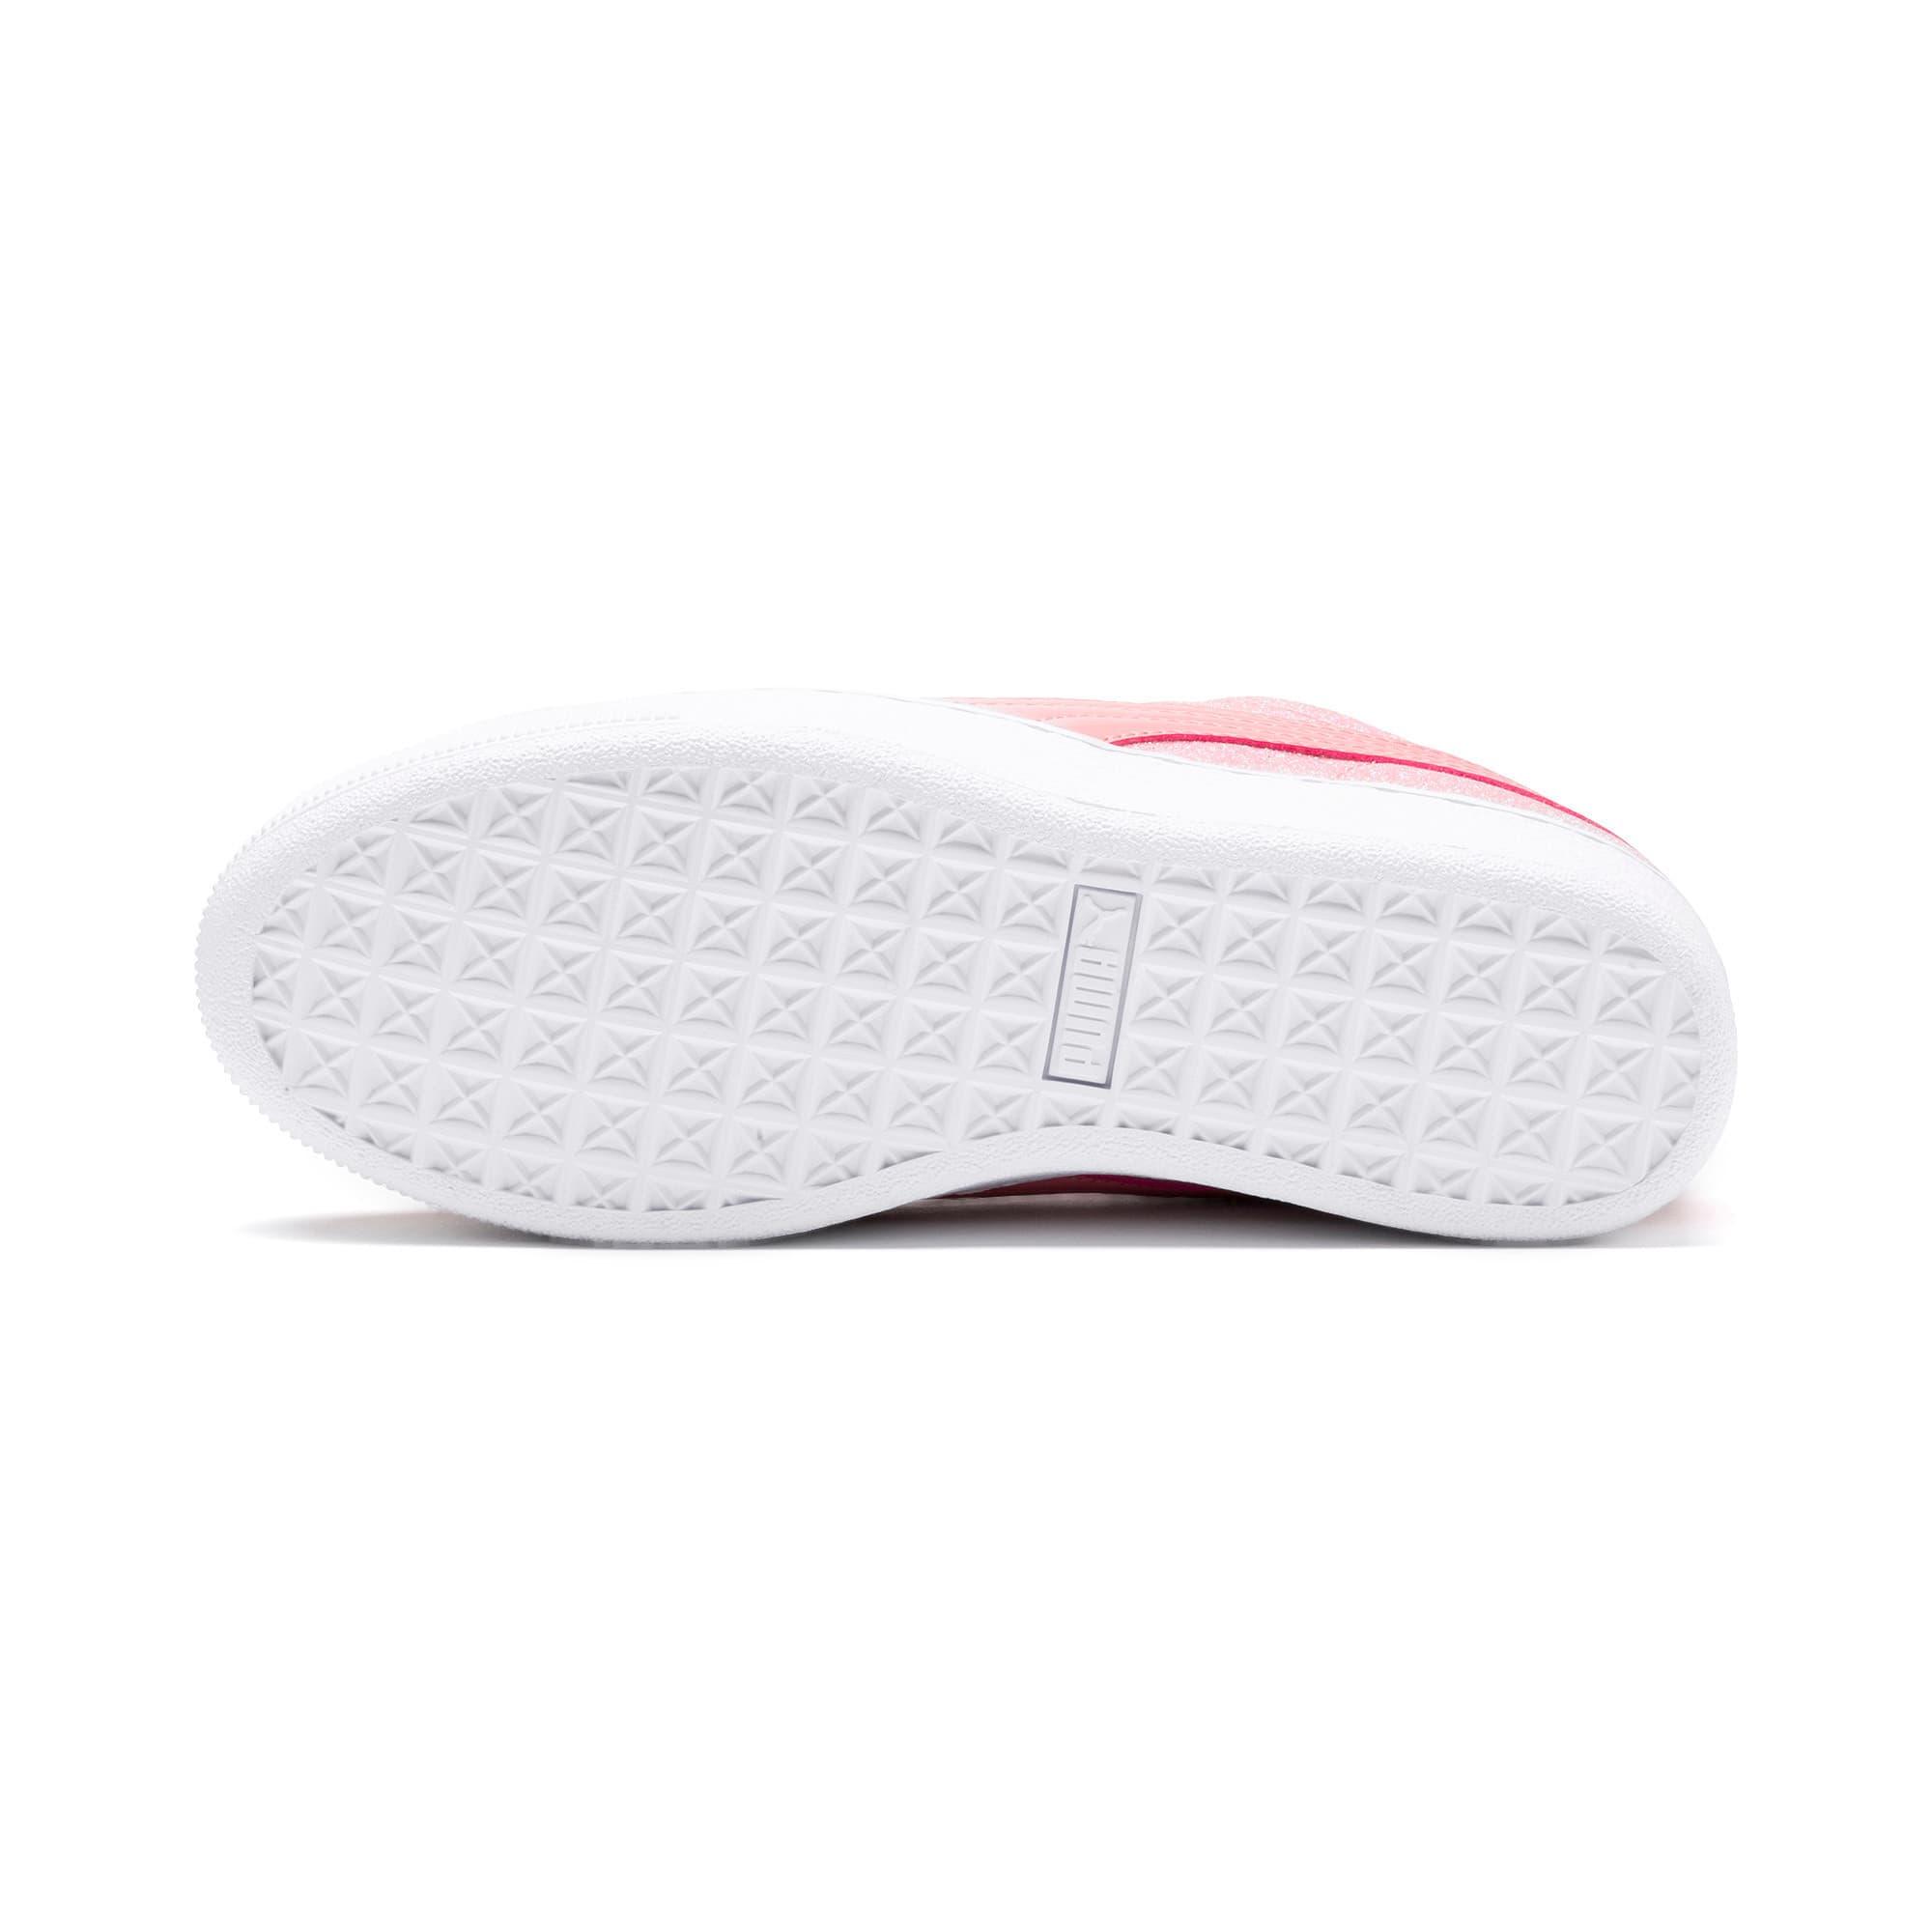 Thumbnail 4 of PUMA Vikky Platform Glitz Sneakers JR, Bridal Rose-Bridal Rose, medium